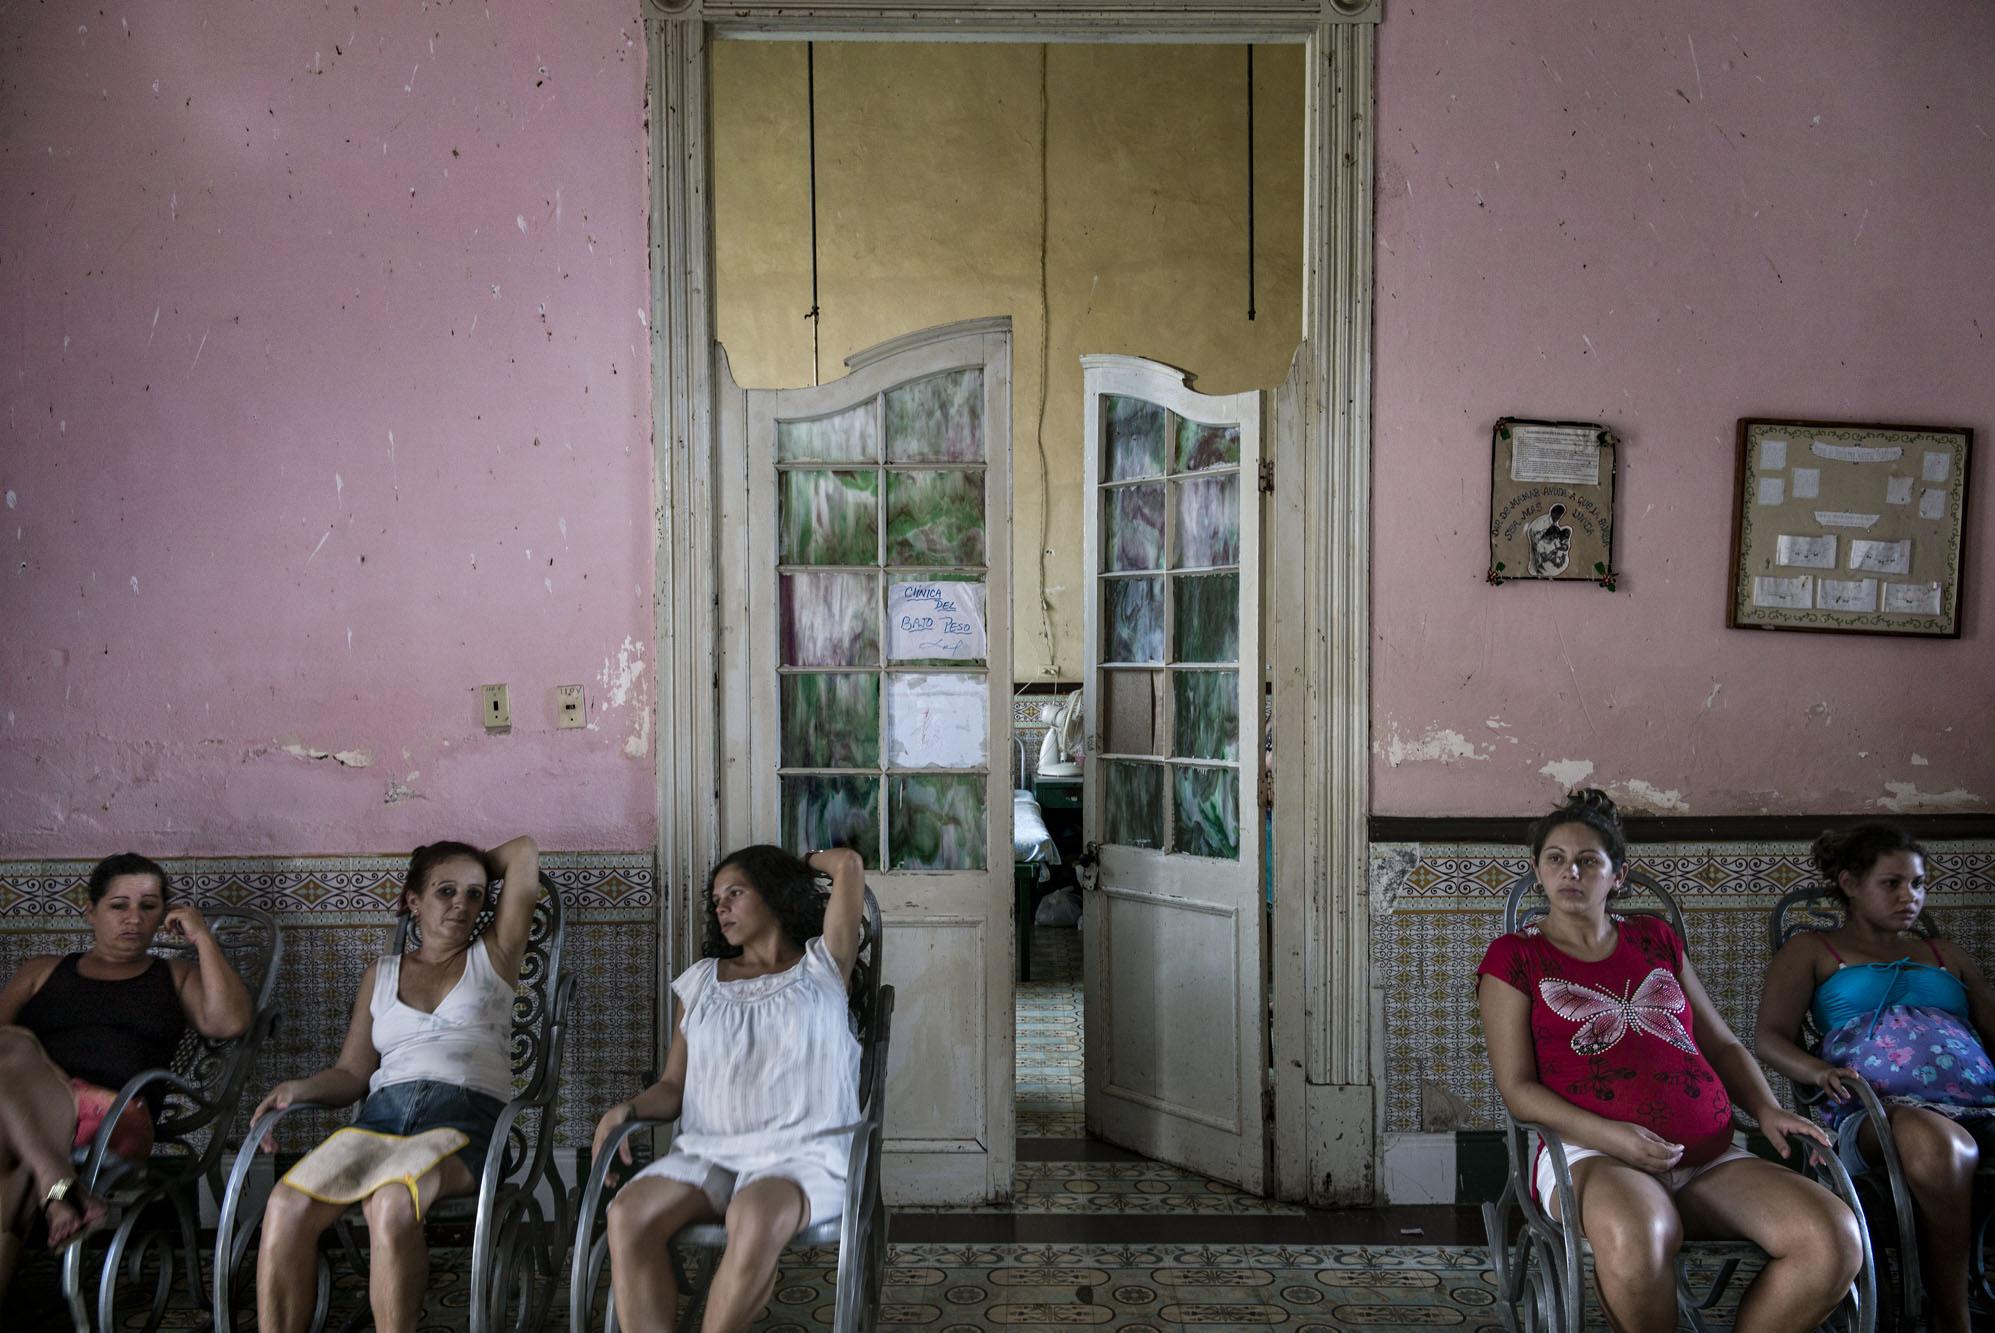 Teen girls in Las Tunas